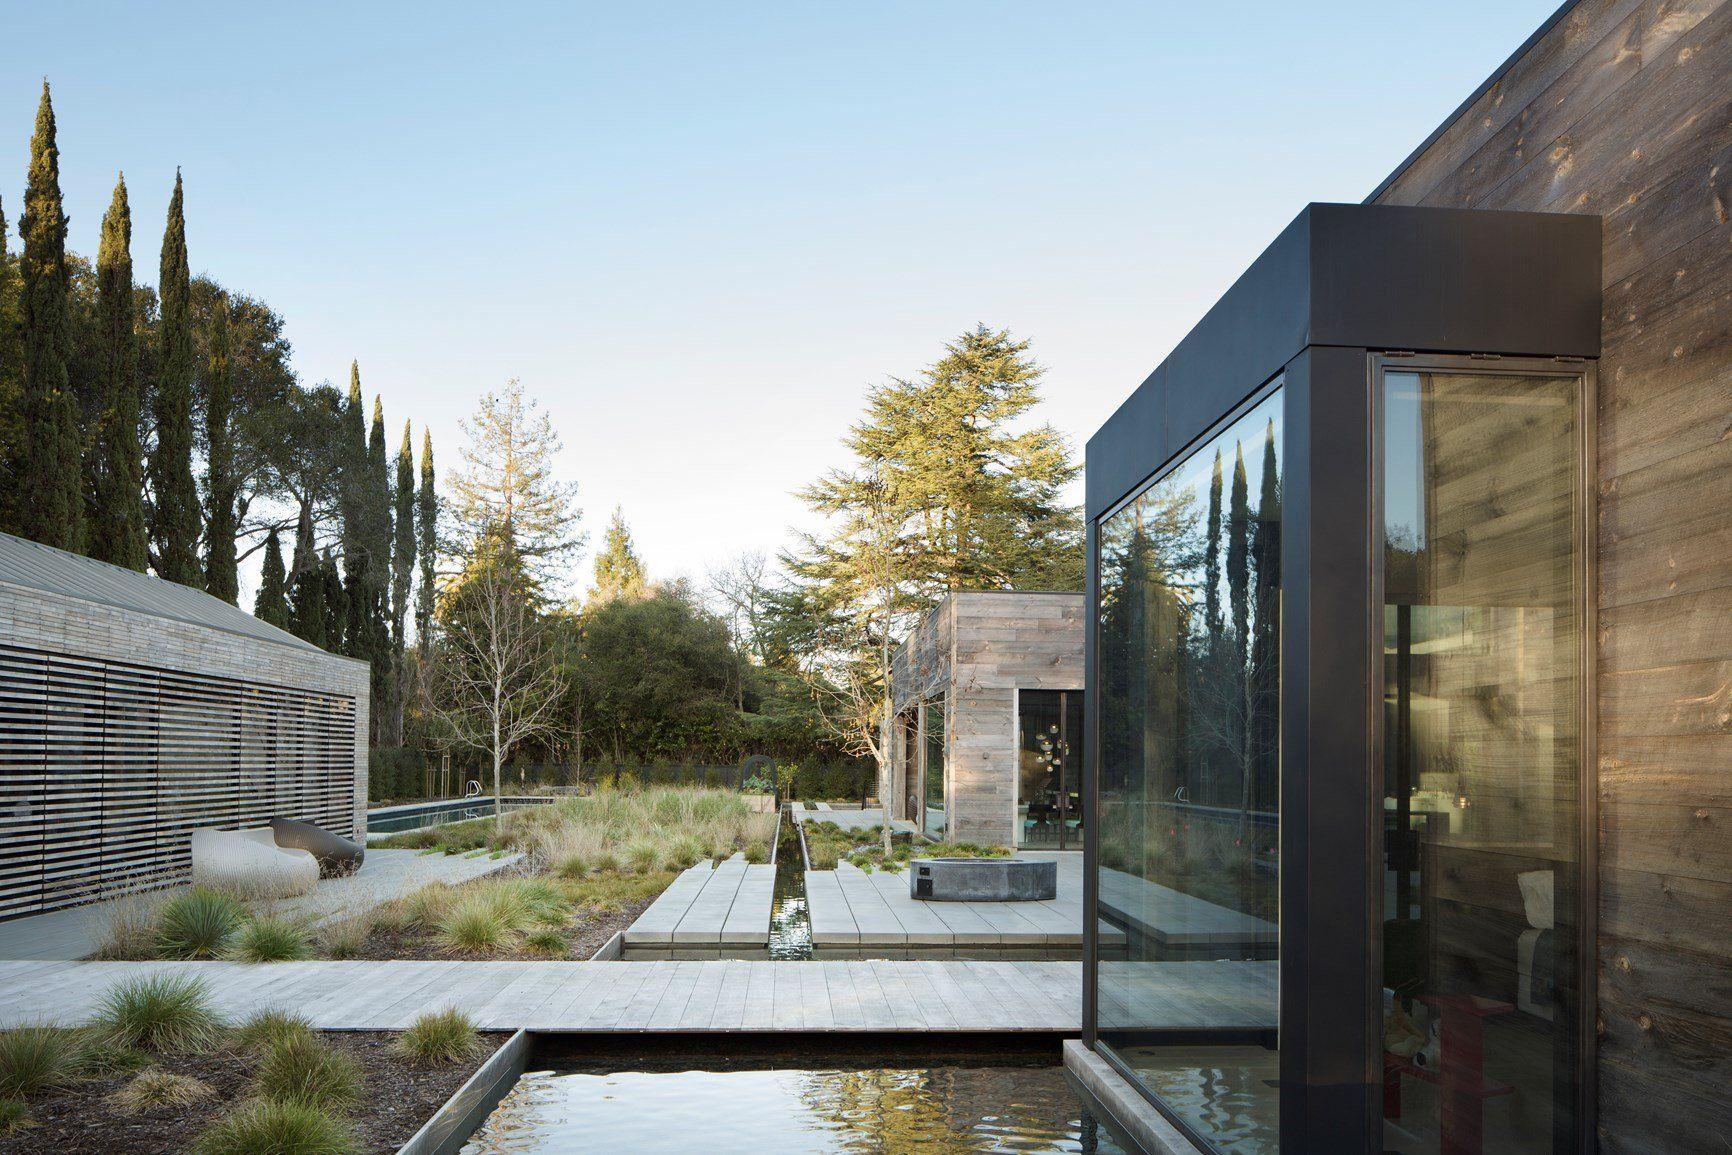 Un'abitazione californiana ispirata all'arte di Escher